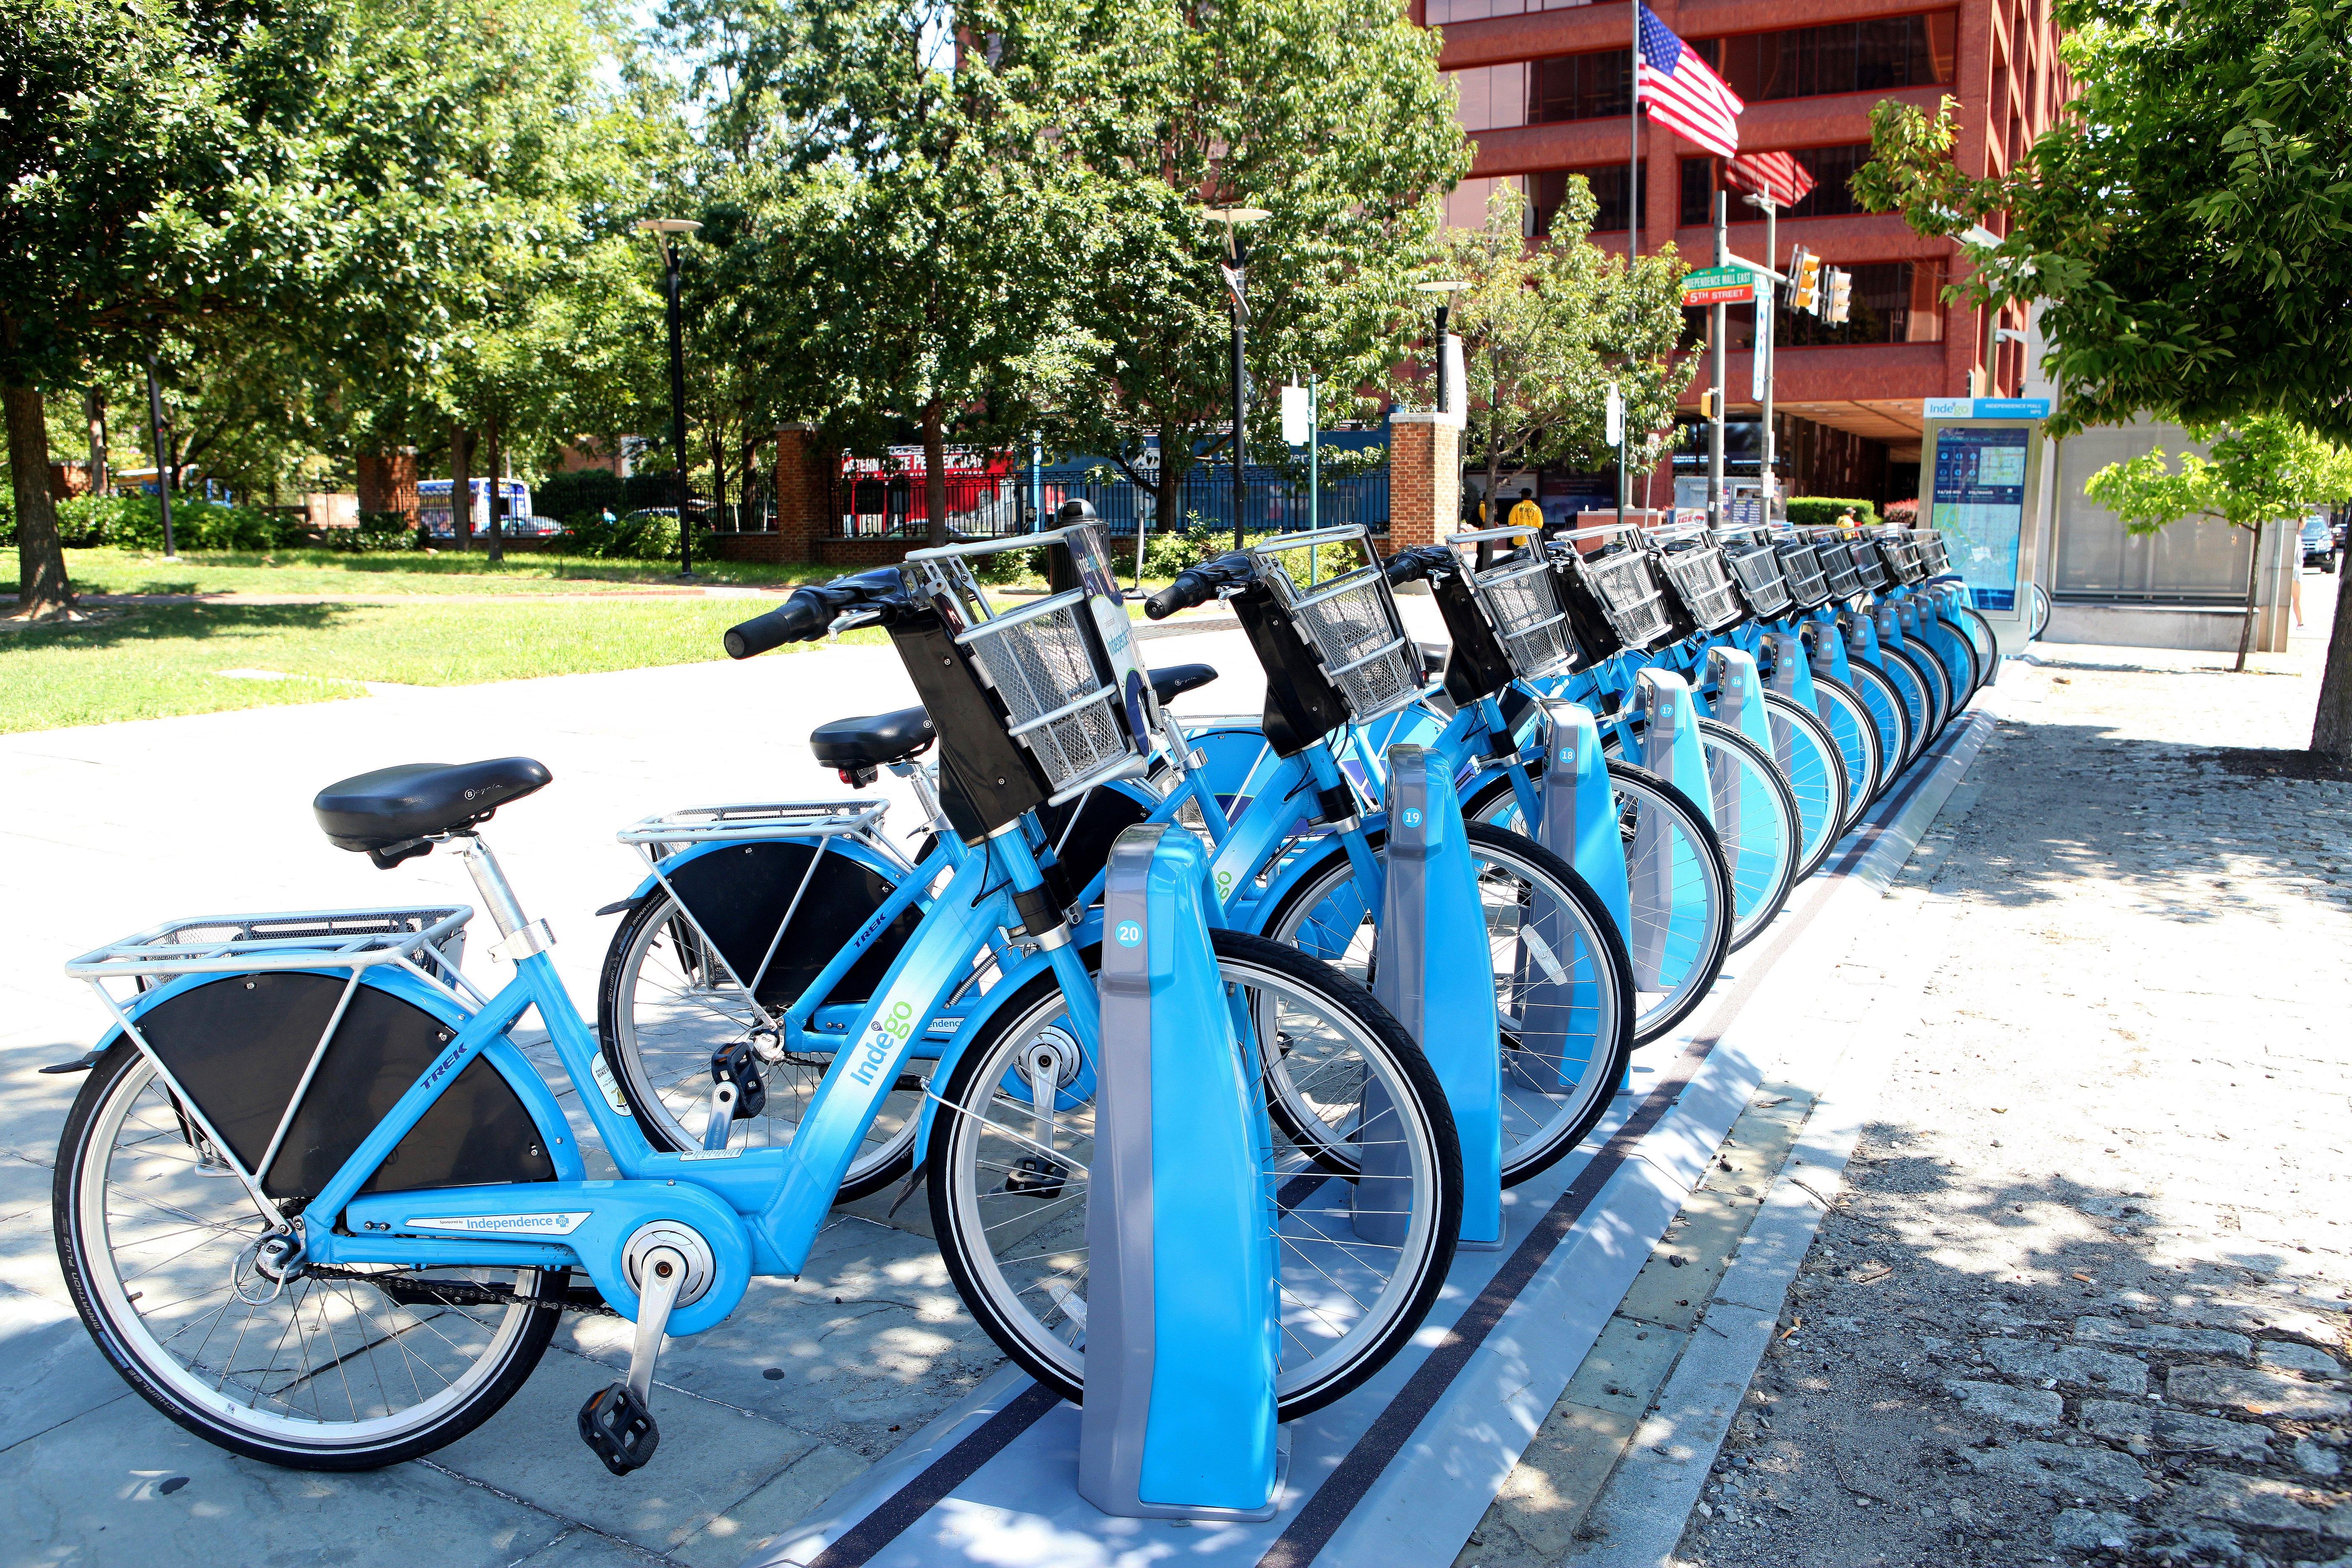 PHILADELPHIA - AUGUST 27:  Philadelphia Bikeshare bicycles downtown on Market Street in Philadelphia, Pennsylvania on August 27, 2016.  (Photo By Raymond Boyd/Getty Images)